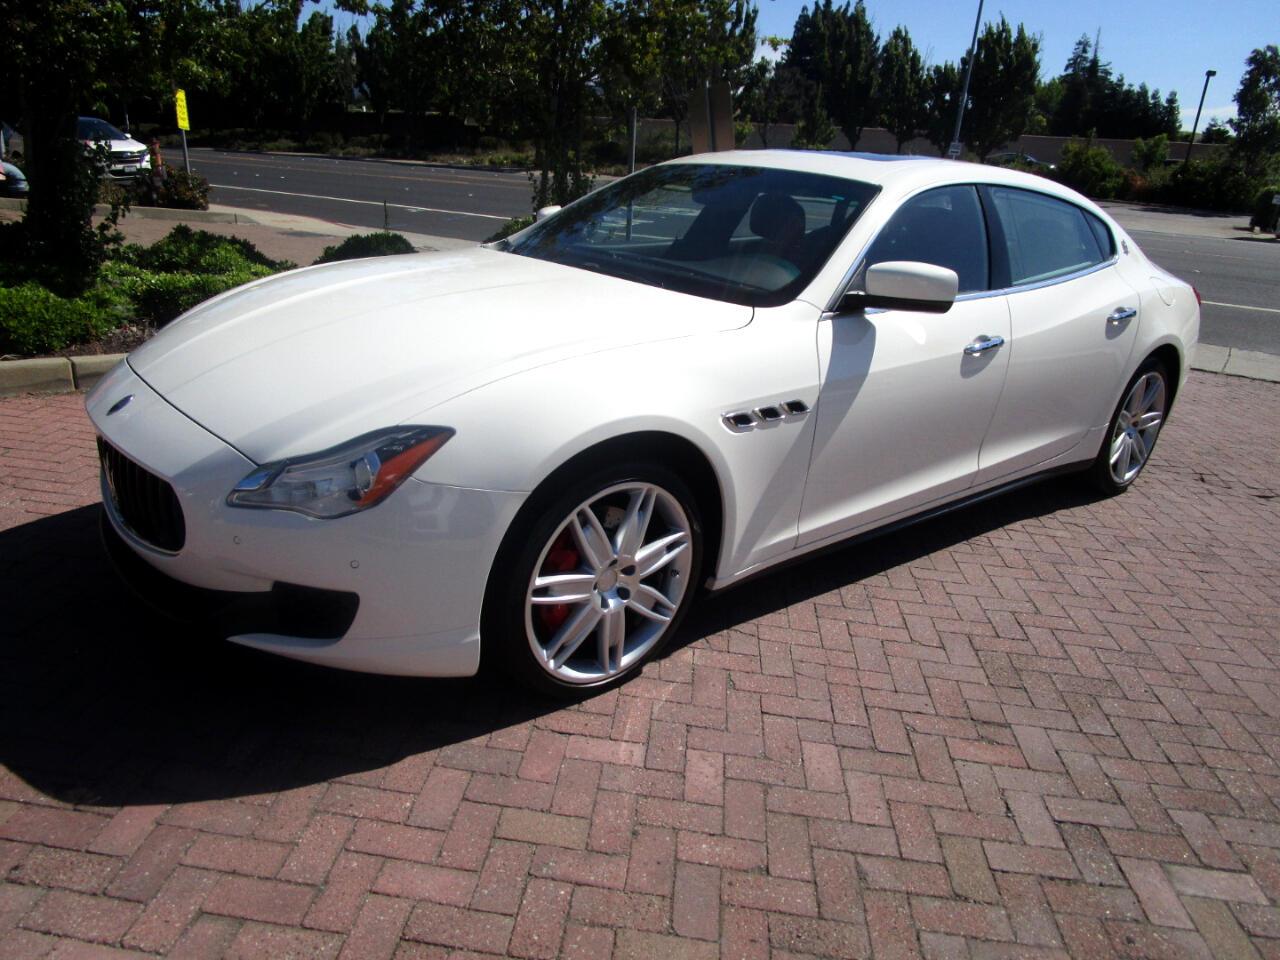 2015 Maserati Quattroporte SQ4 TURBO QUATTRO*HEAT SEATS*NAV*SAT RADIO*REAR CA